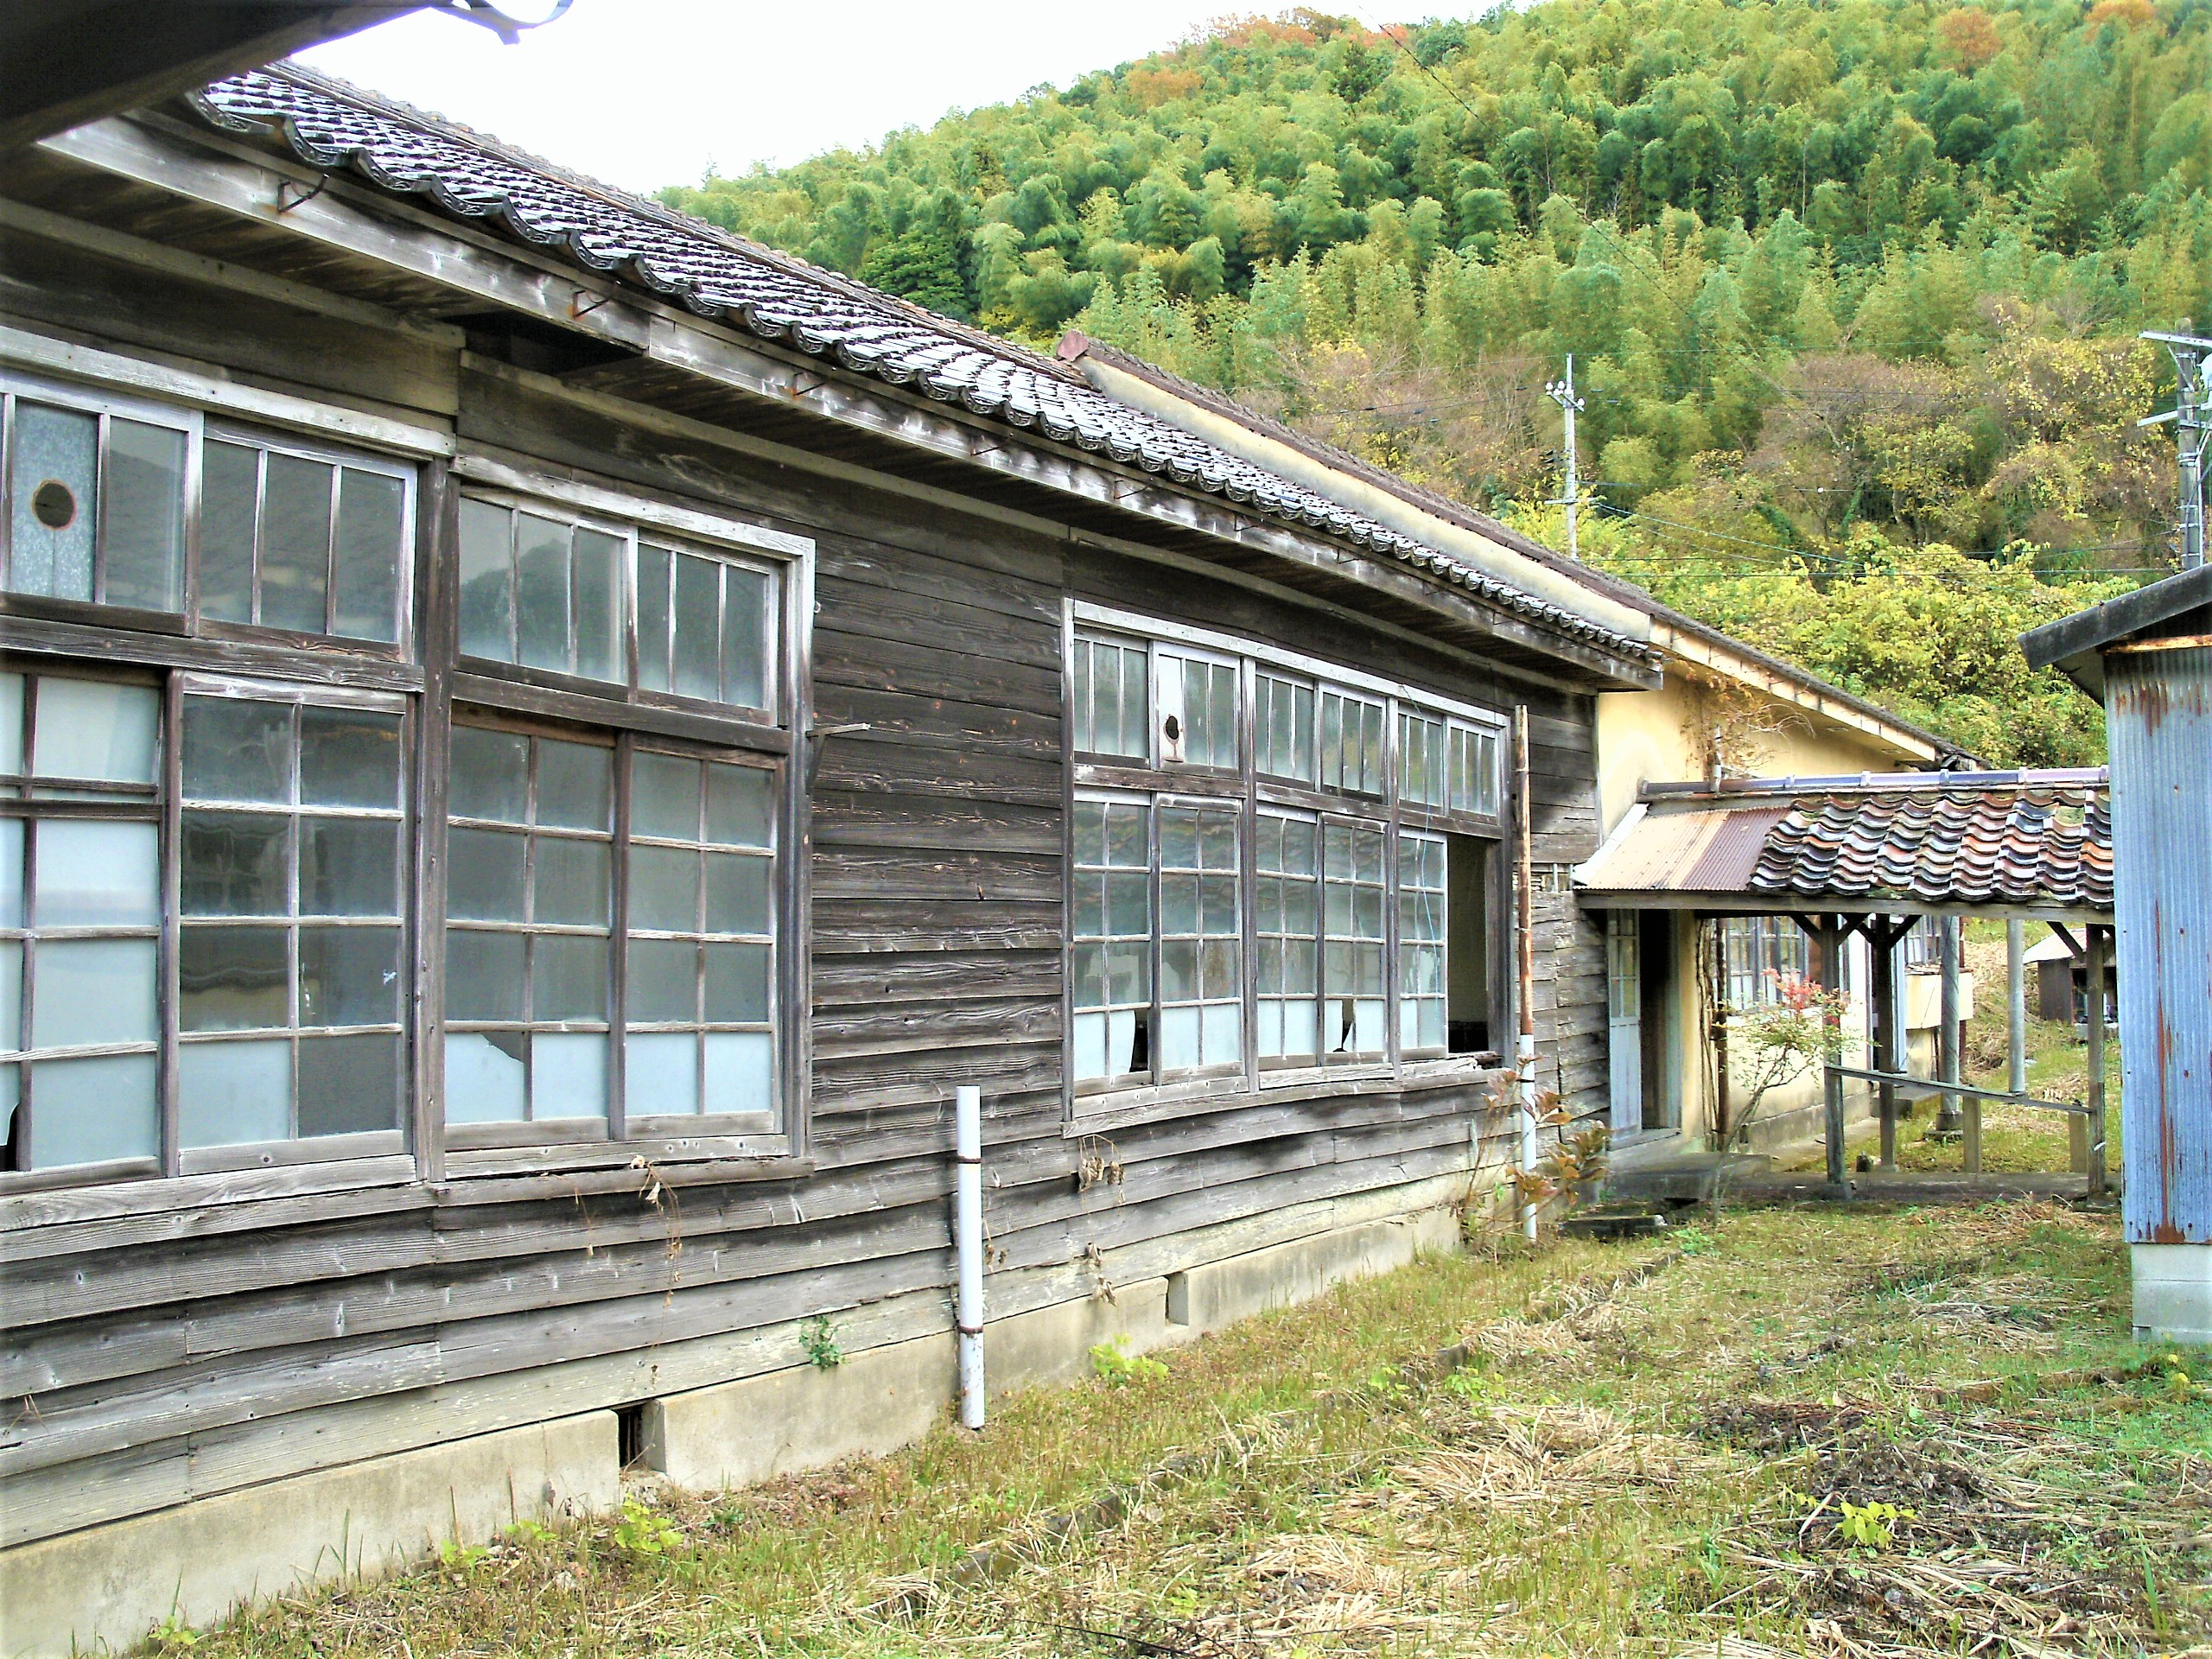 記事美祢市立堀越小学校 閉校のイメージ画像